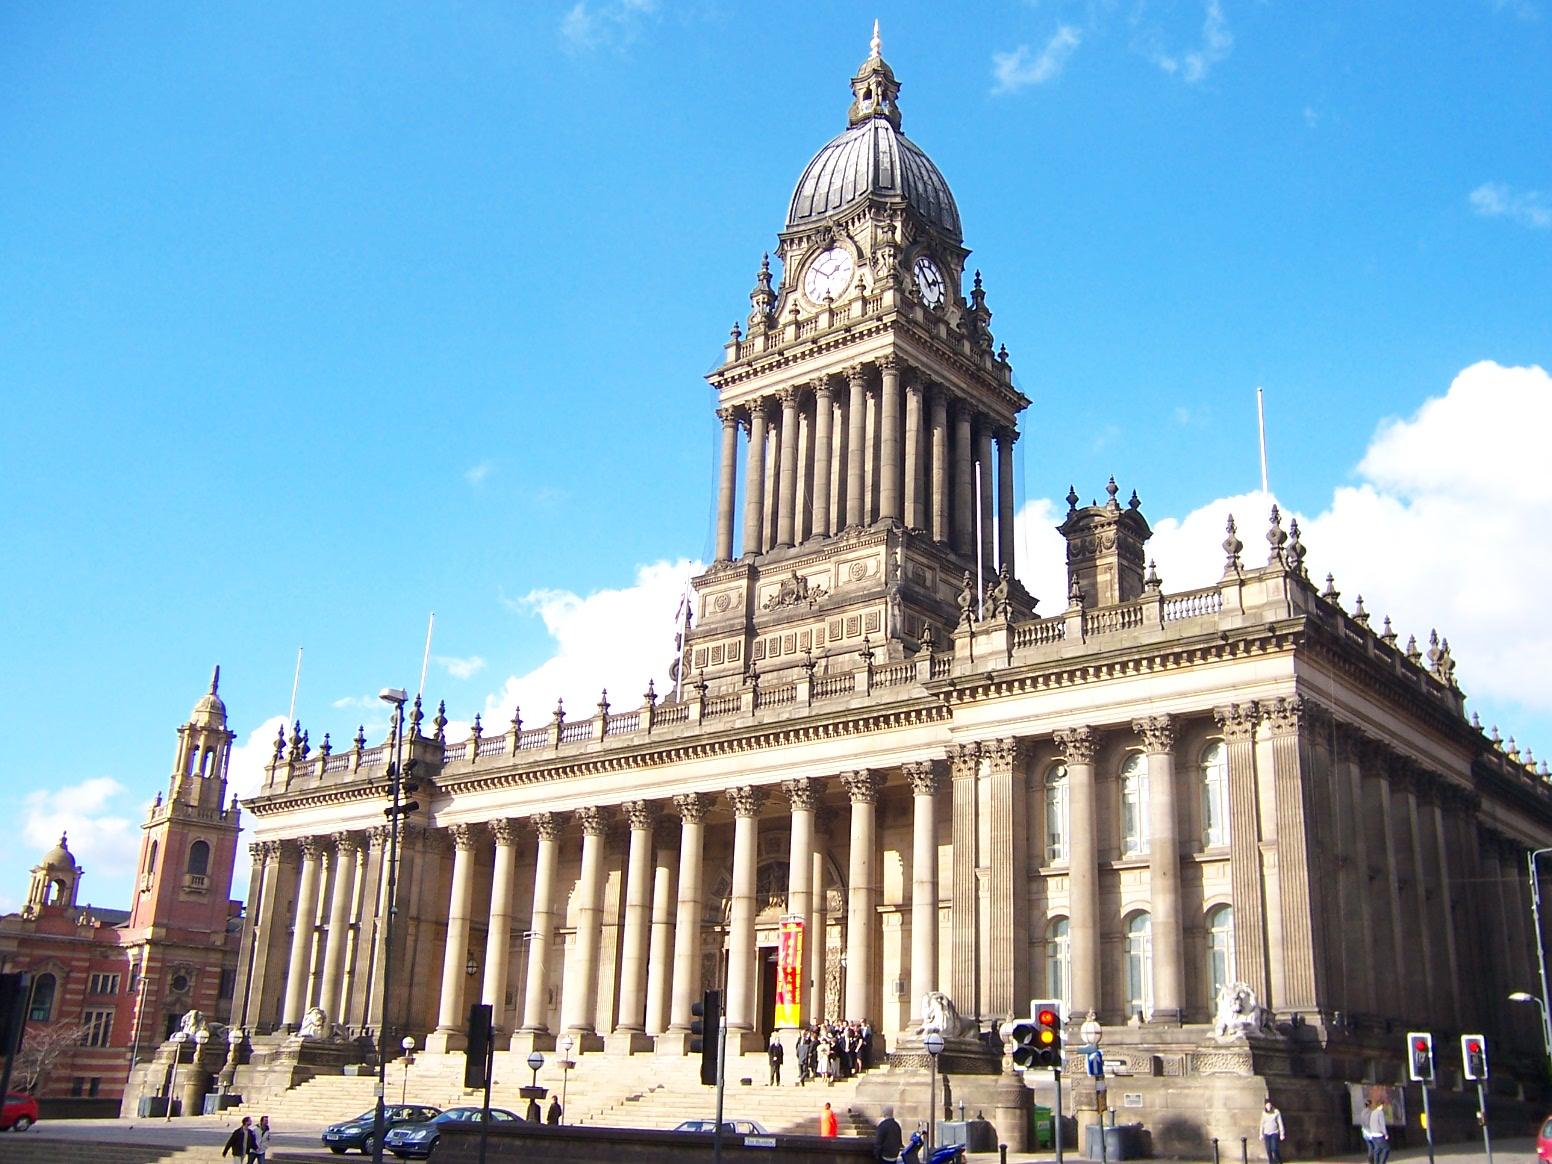 North England Economy: Cranes Return to Leeds to Rebuild its Property Market